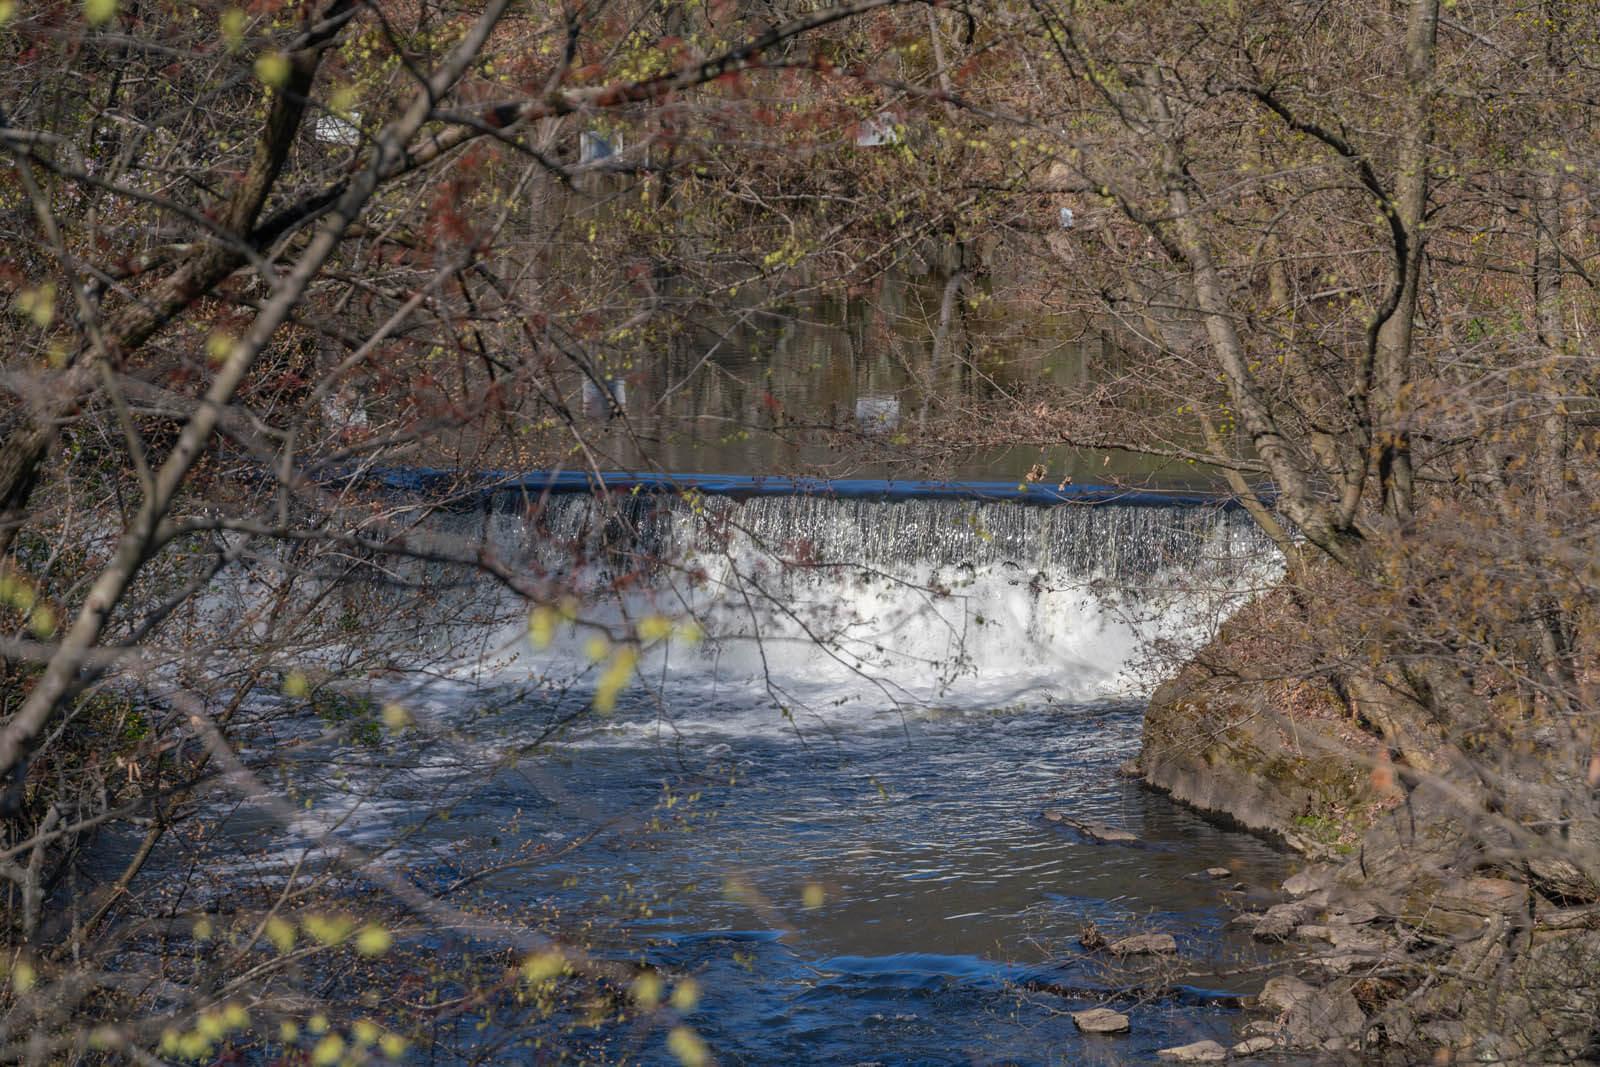 Snuff Mill waterfall in New York Botanical Garden in the Bronx